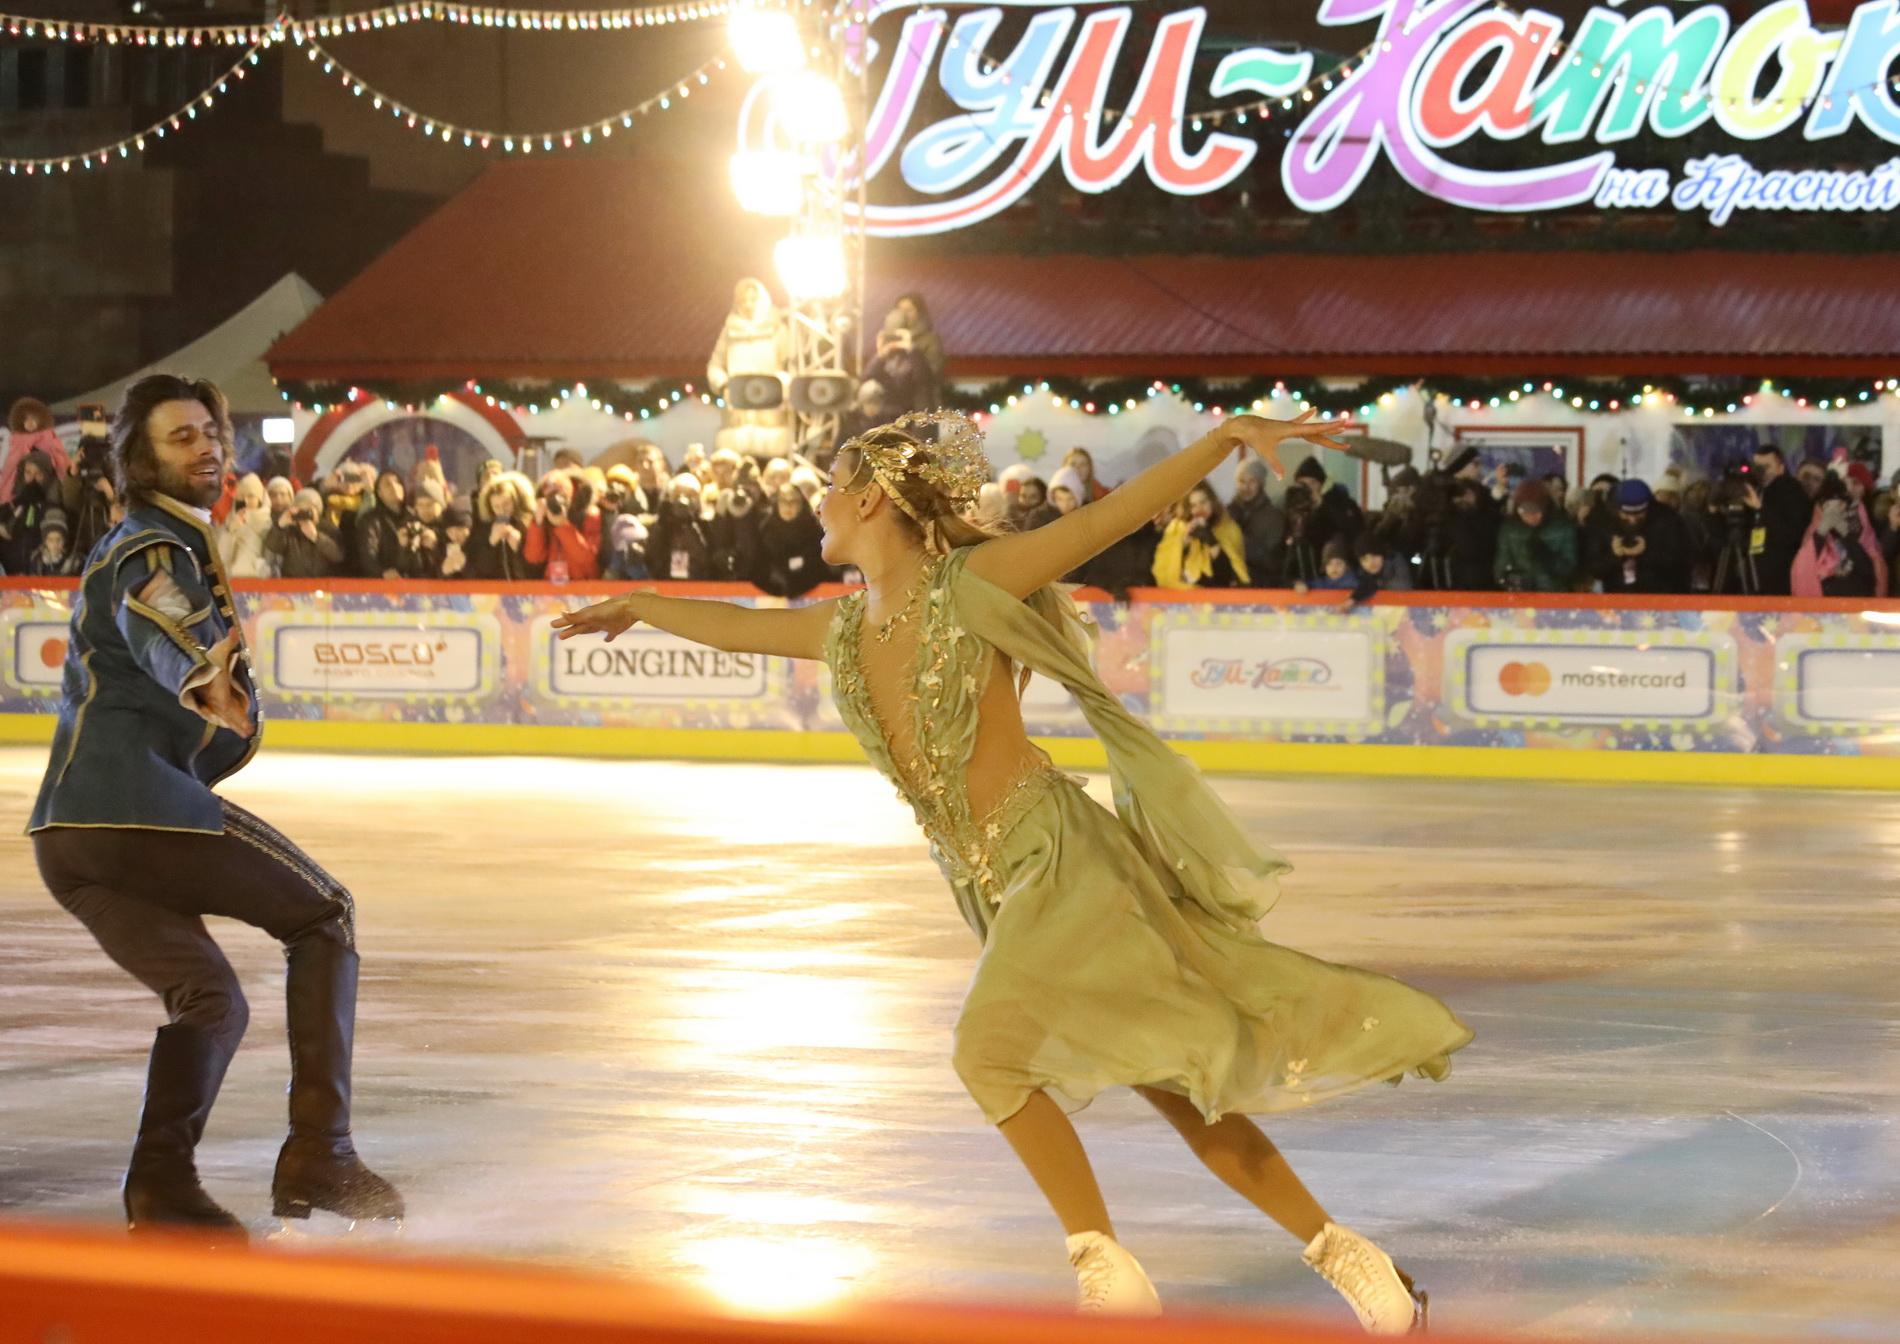 Ледовые шоу-2018-2019 - Страница 12 Tatyana-navka-i-petr-chernyshev-1042347